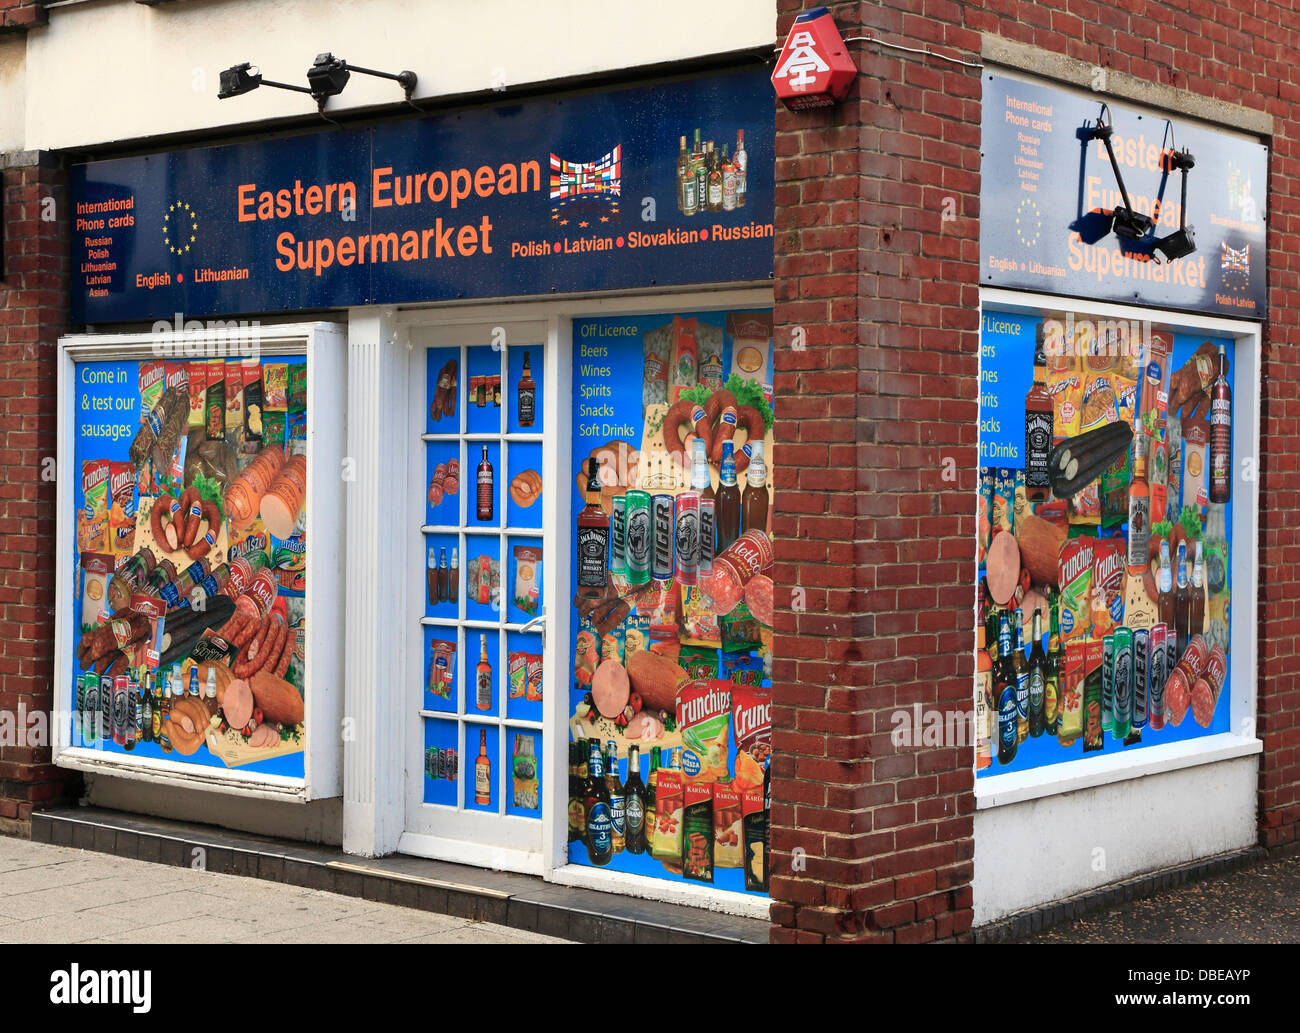 Eastern European Supermarket, Kings Lynn, Norfolk, England UK, to serve East European immigrants immigration, shop - Stock Image